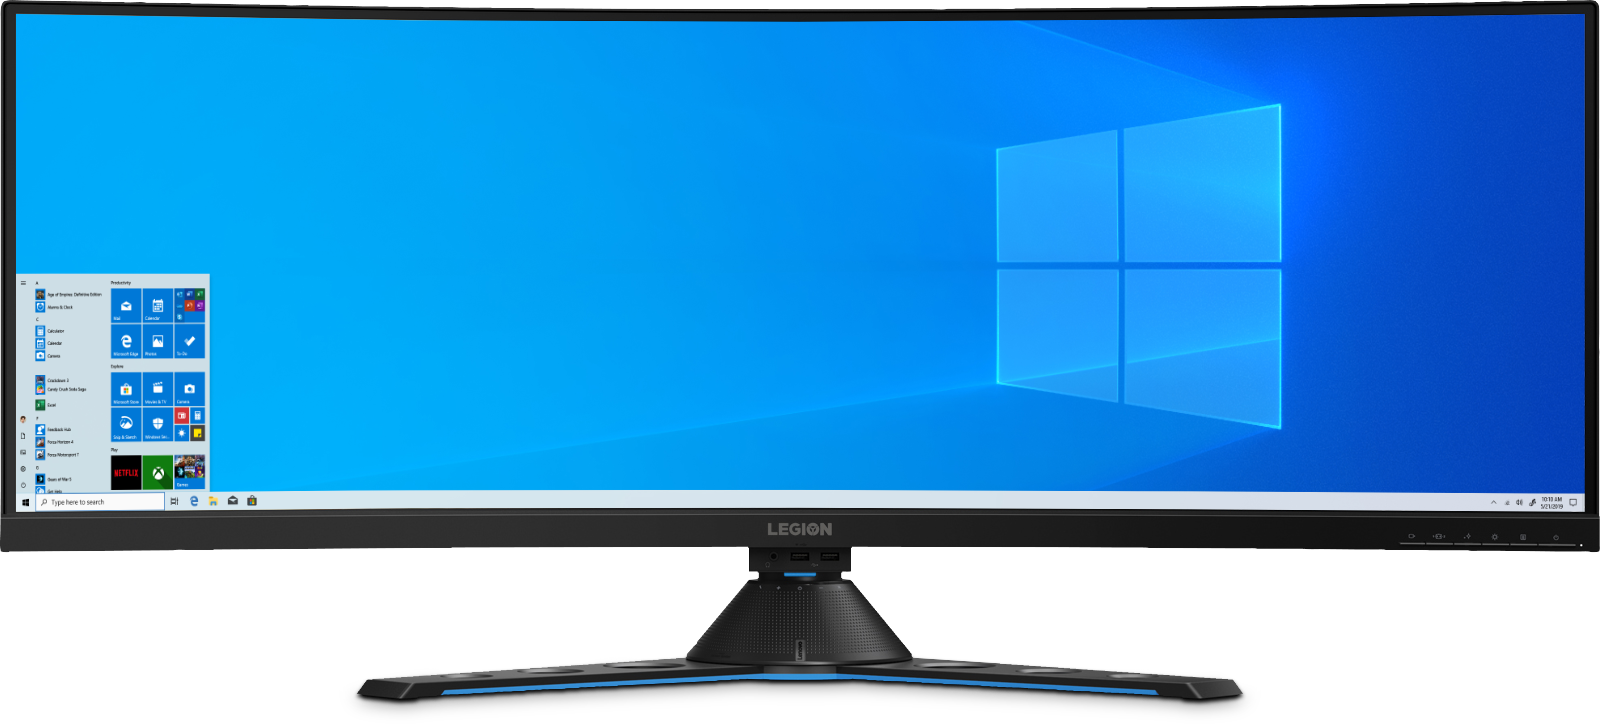 "RE4qZUK?ver=38fe - Lenovo Legion Y44w-10 43.4"""" Gaming Monitor"